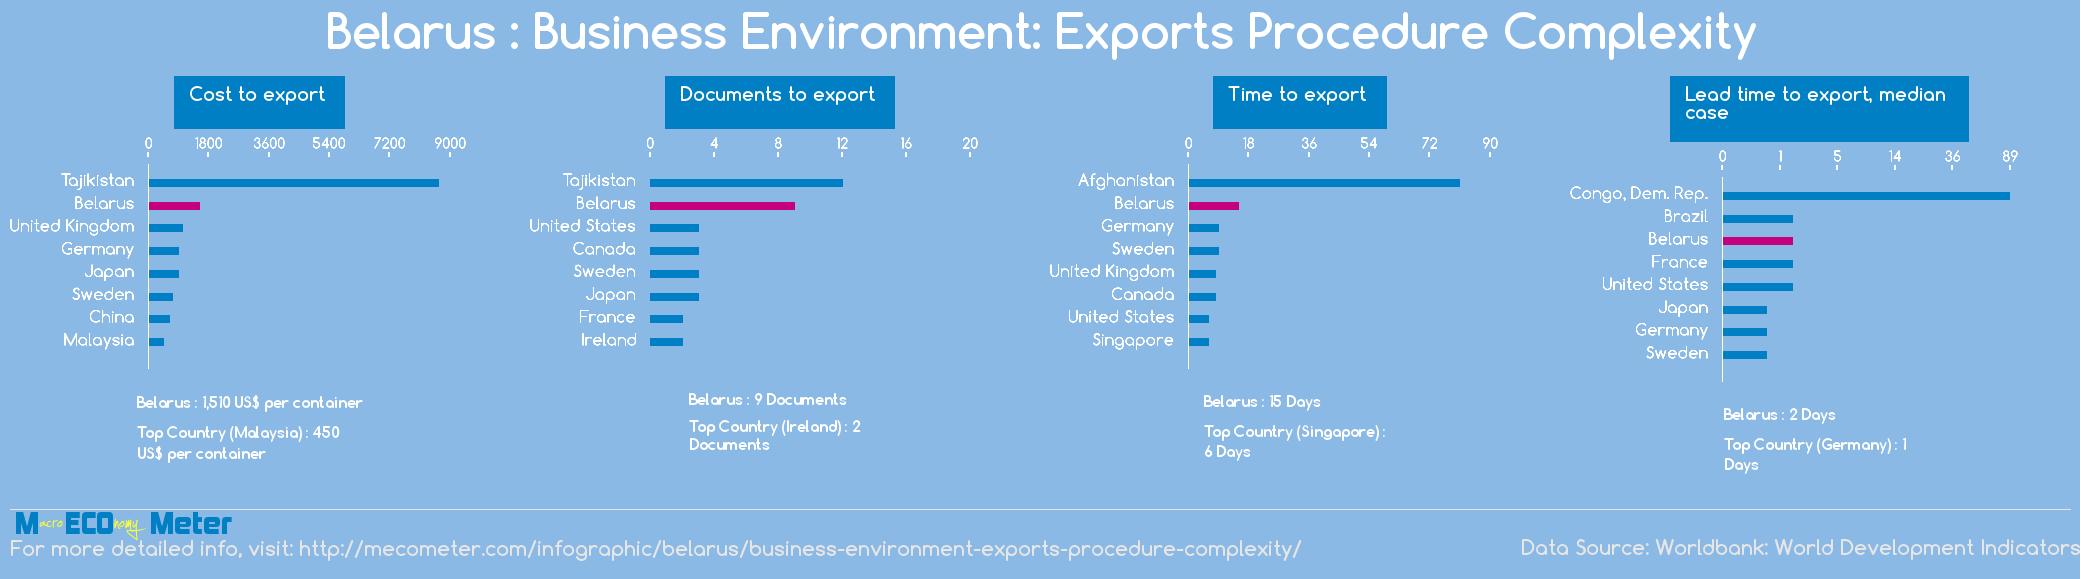 Belarus : Business Environment: Exports Procedure Complexity